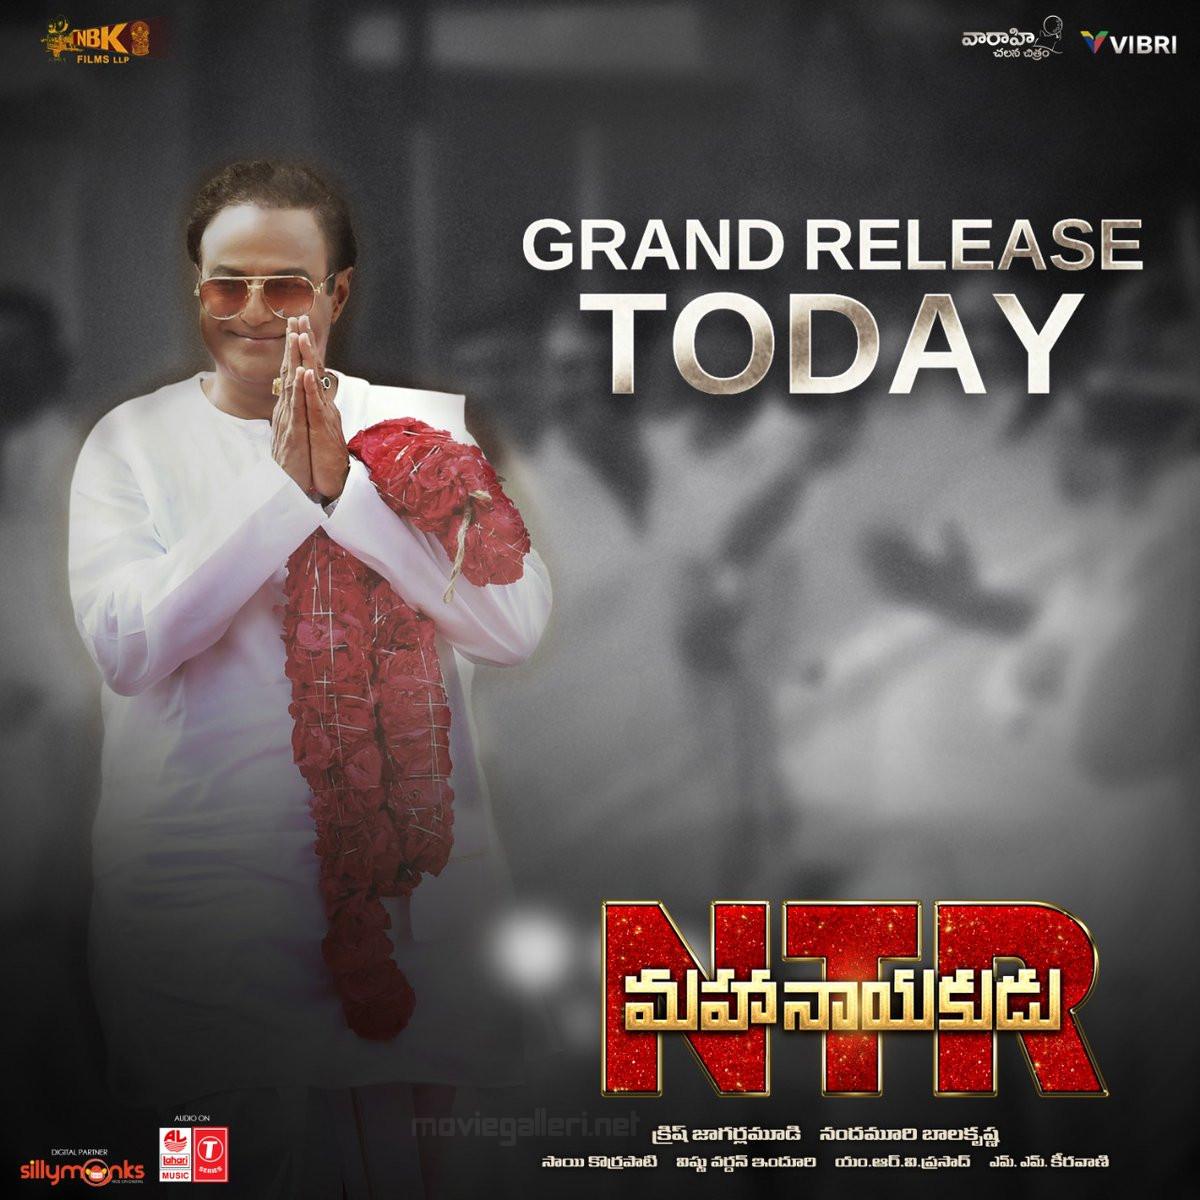 Balakrishna NTR Mahanayakudu Movie Grand Release Today Poster HD